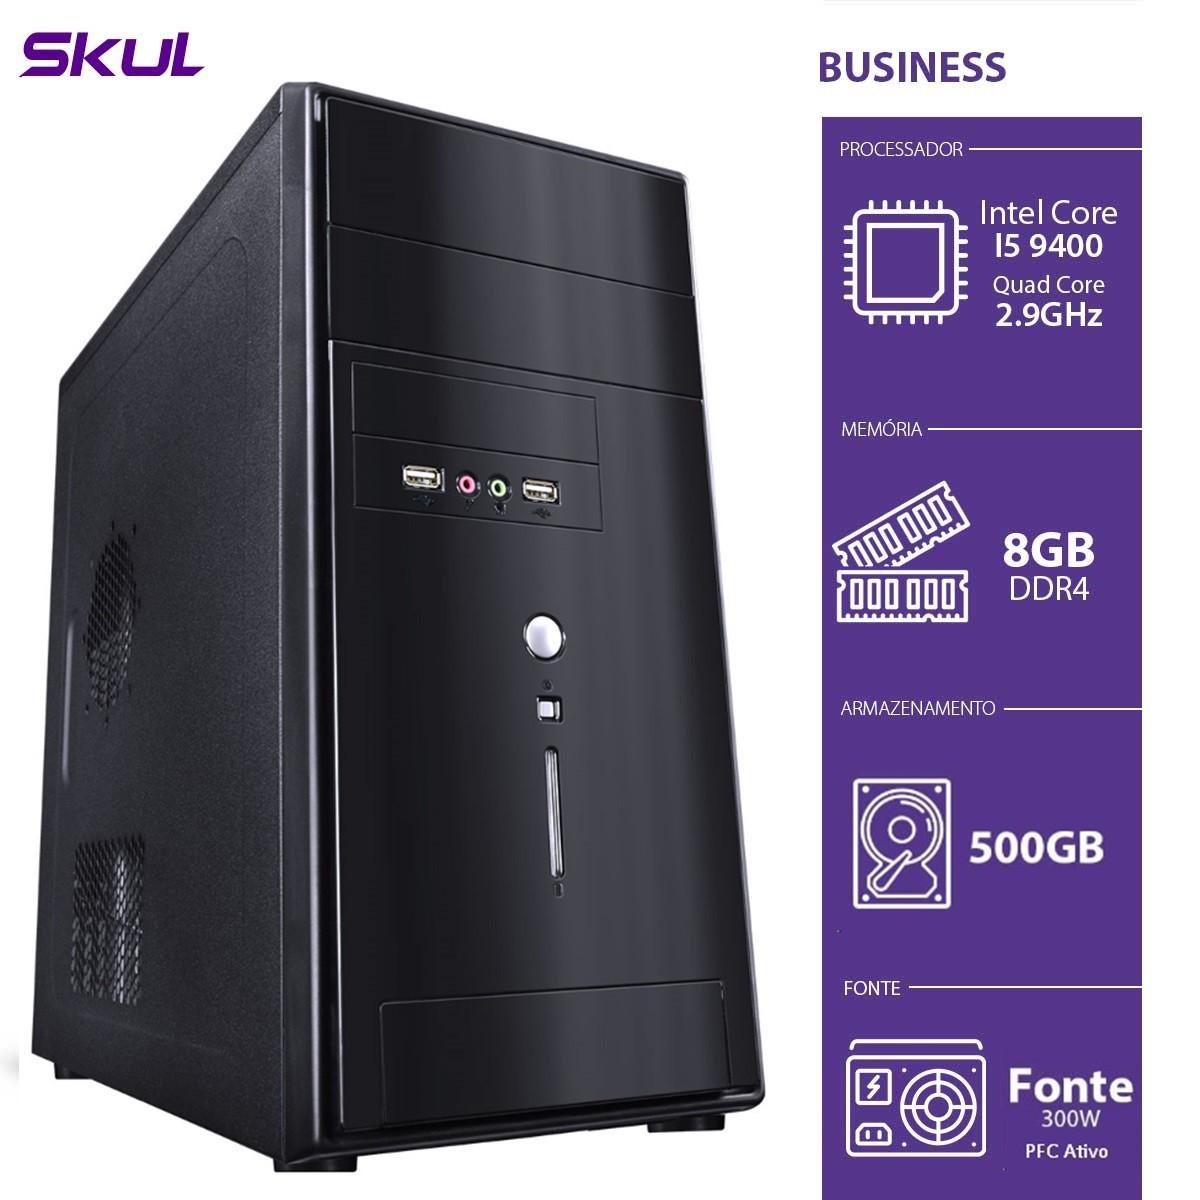 Computador Business B500 - I5-9400 2.9GHZ 8GB DDR4 HD 500GB HDMI/VGA Fonte 300W PFC Ativo